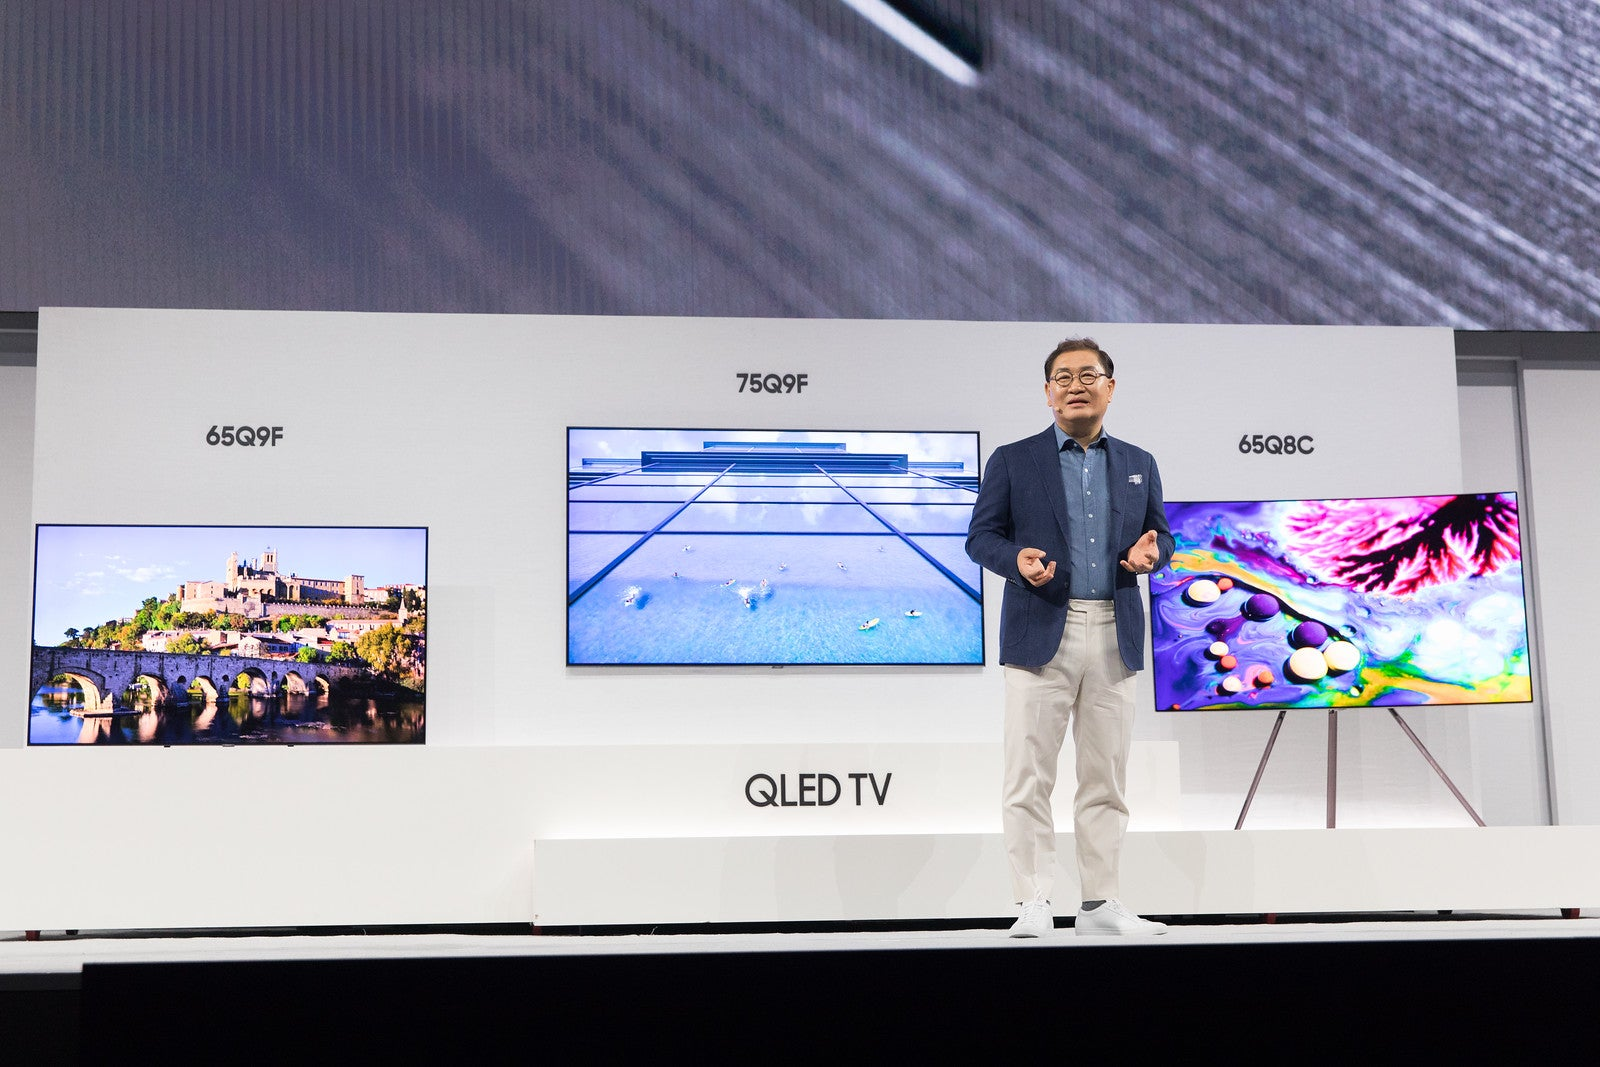 Samsung Qled Tvs 2018 Every New Samsung 4k Tv Explained